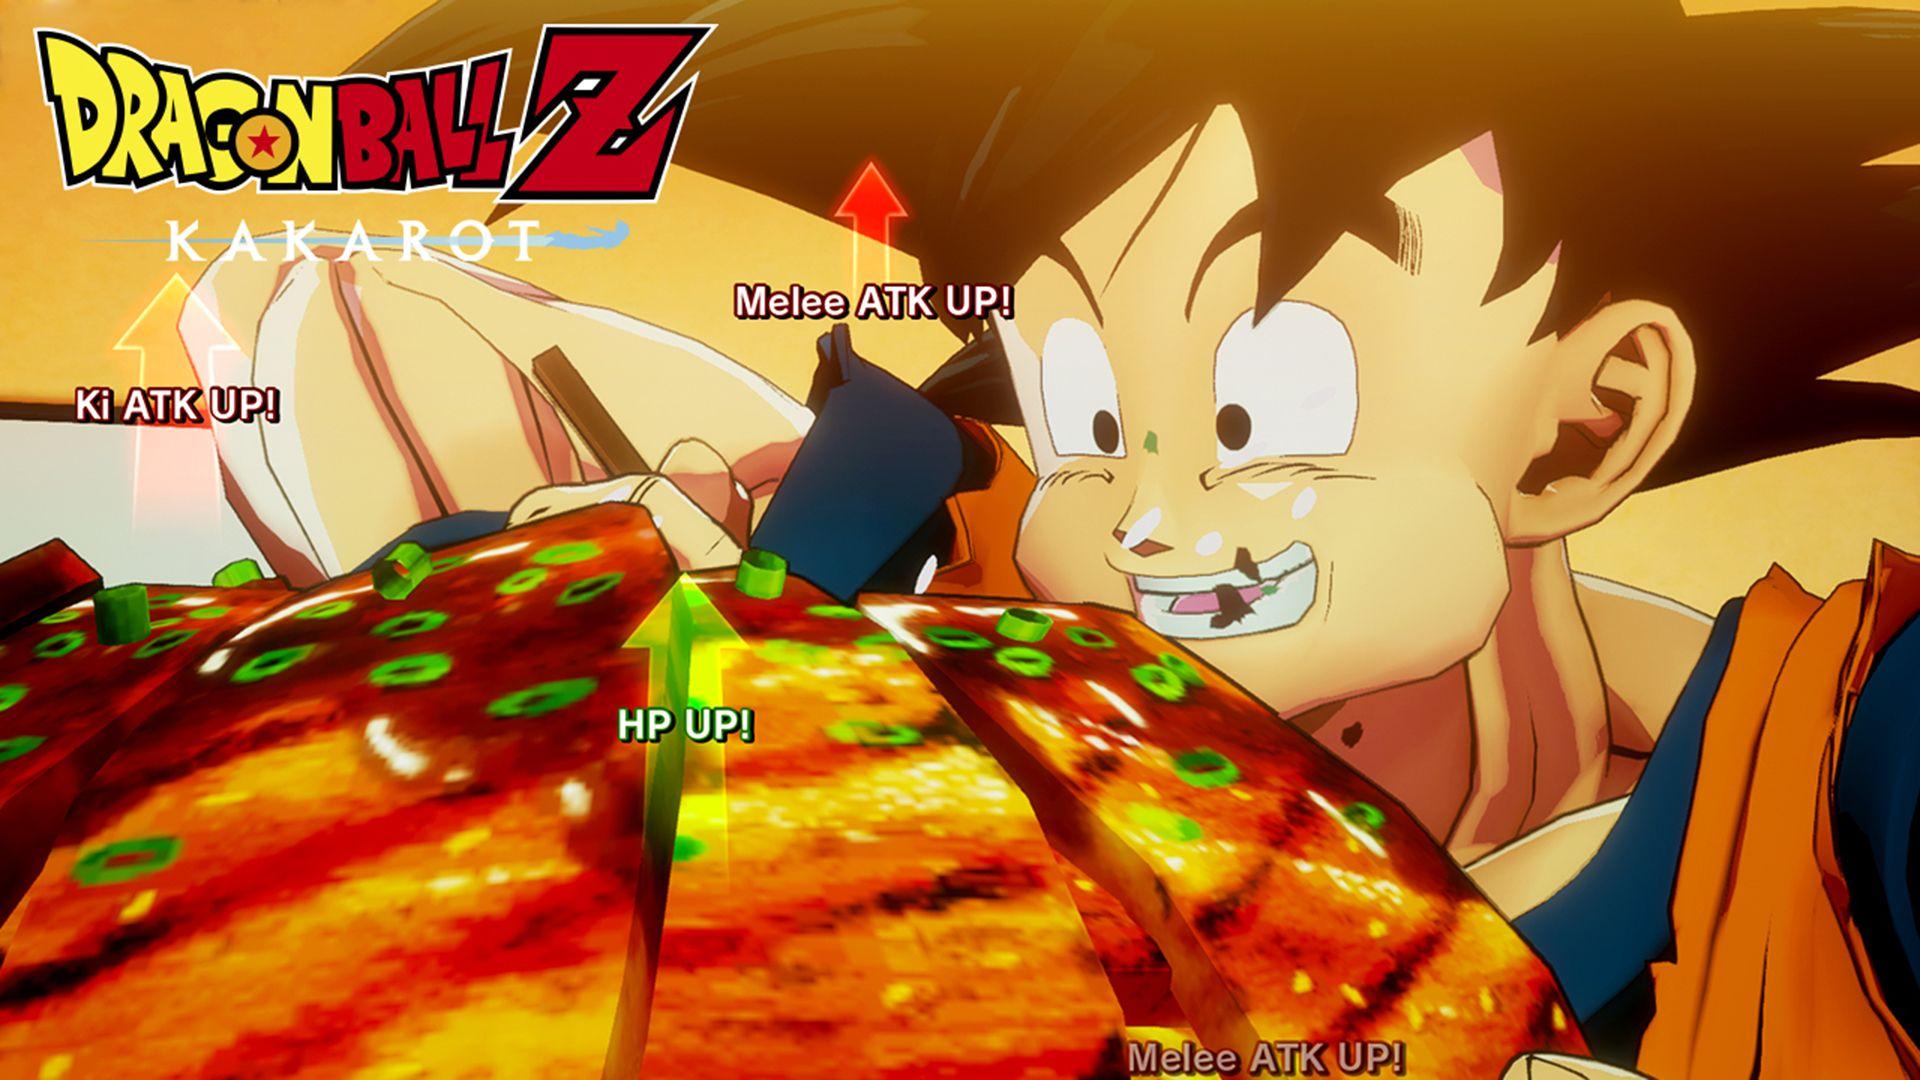 Dragon Ball Z Kakarot Gameplay Showcase 3 Bandai Namco Ent